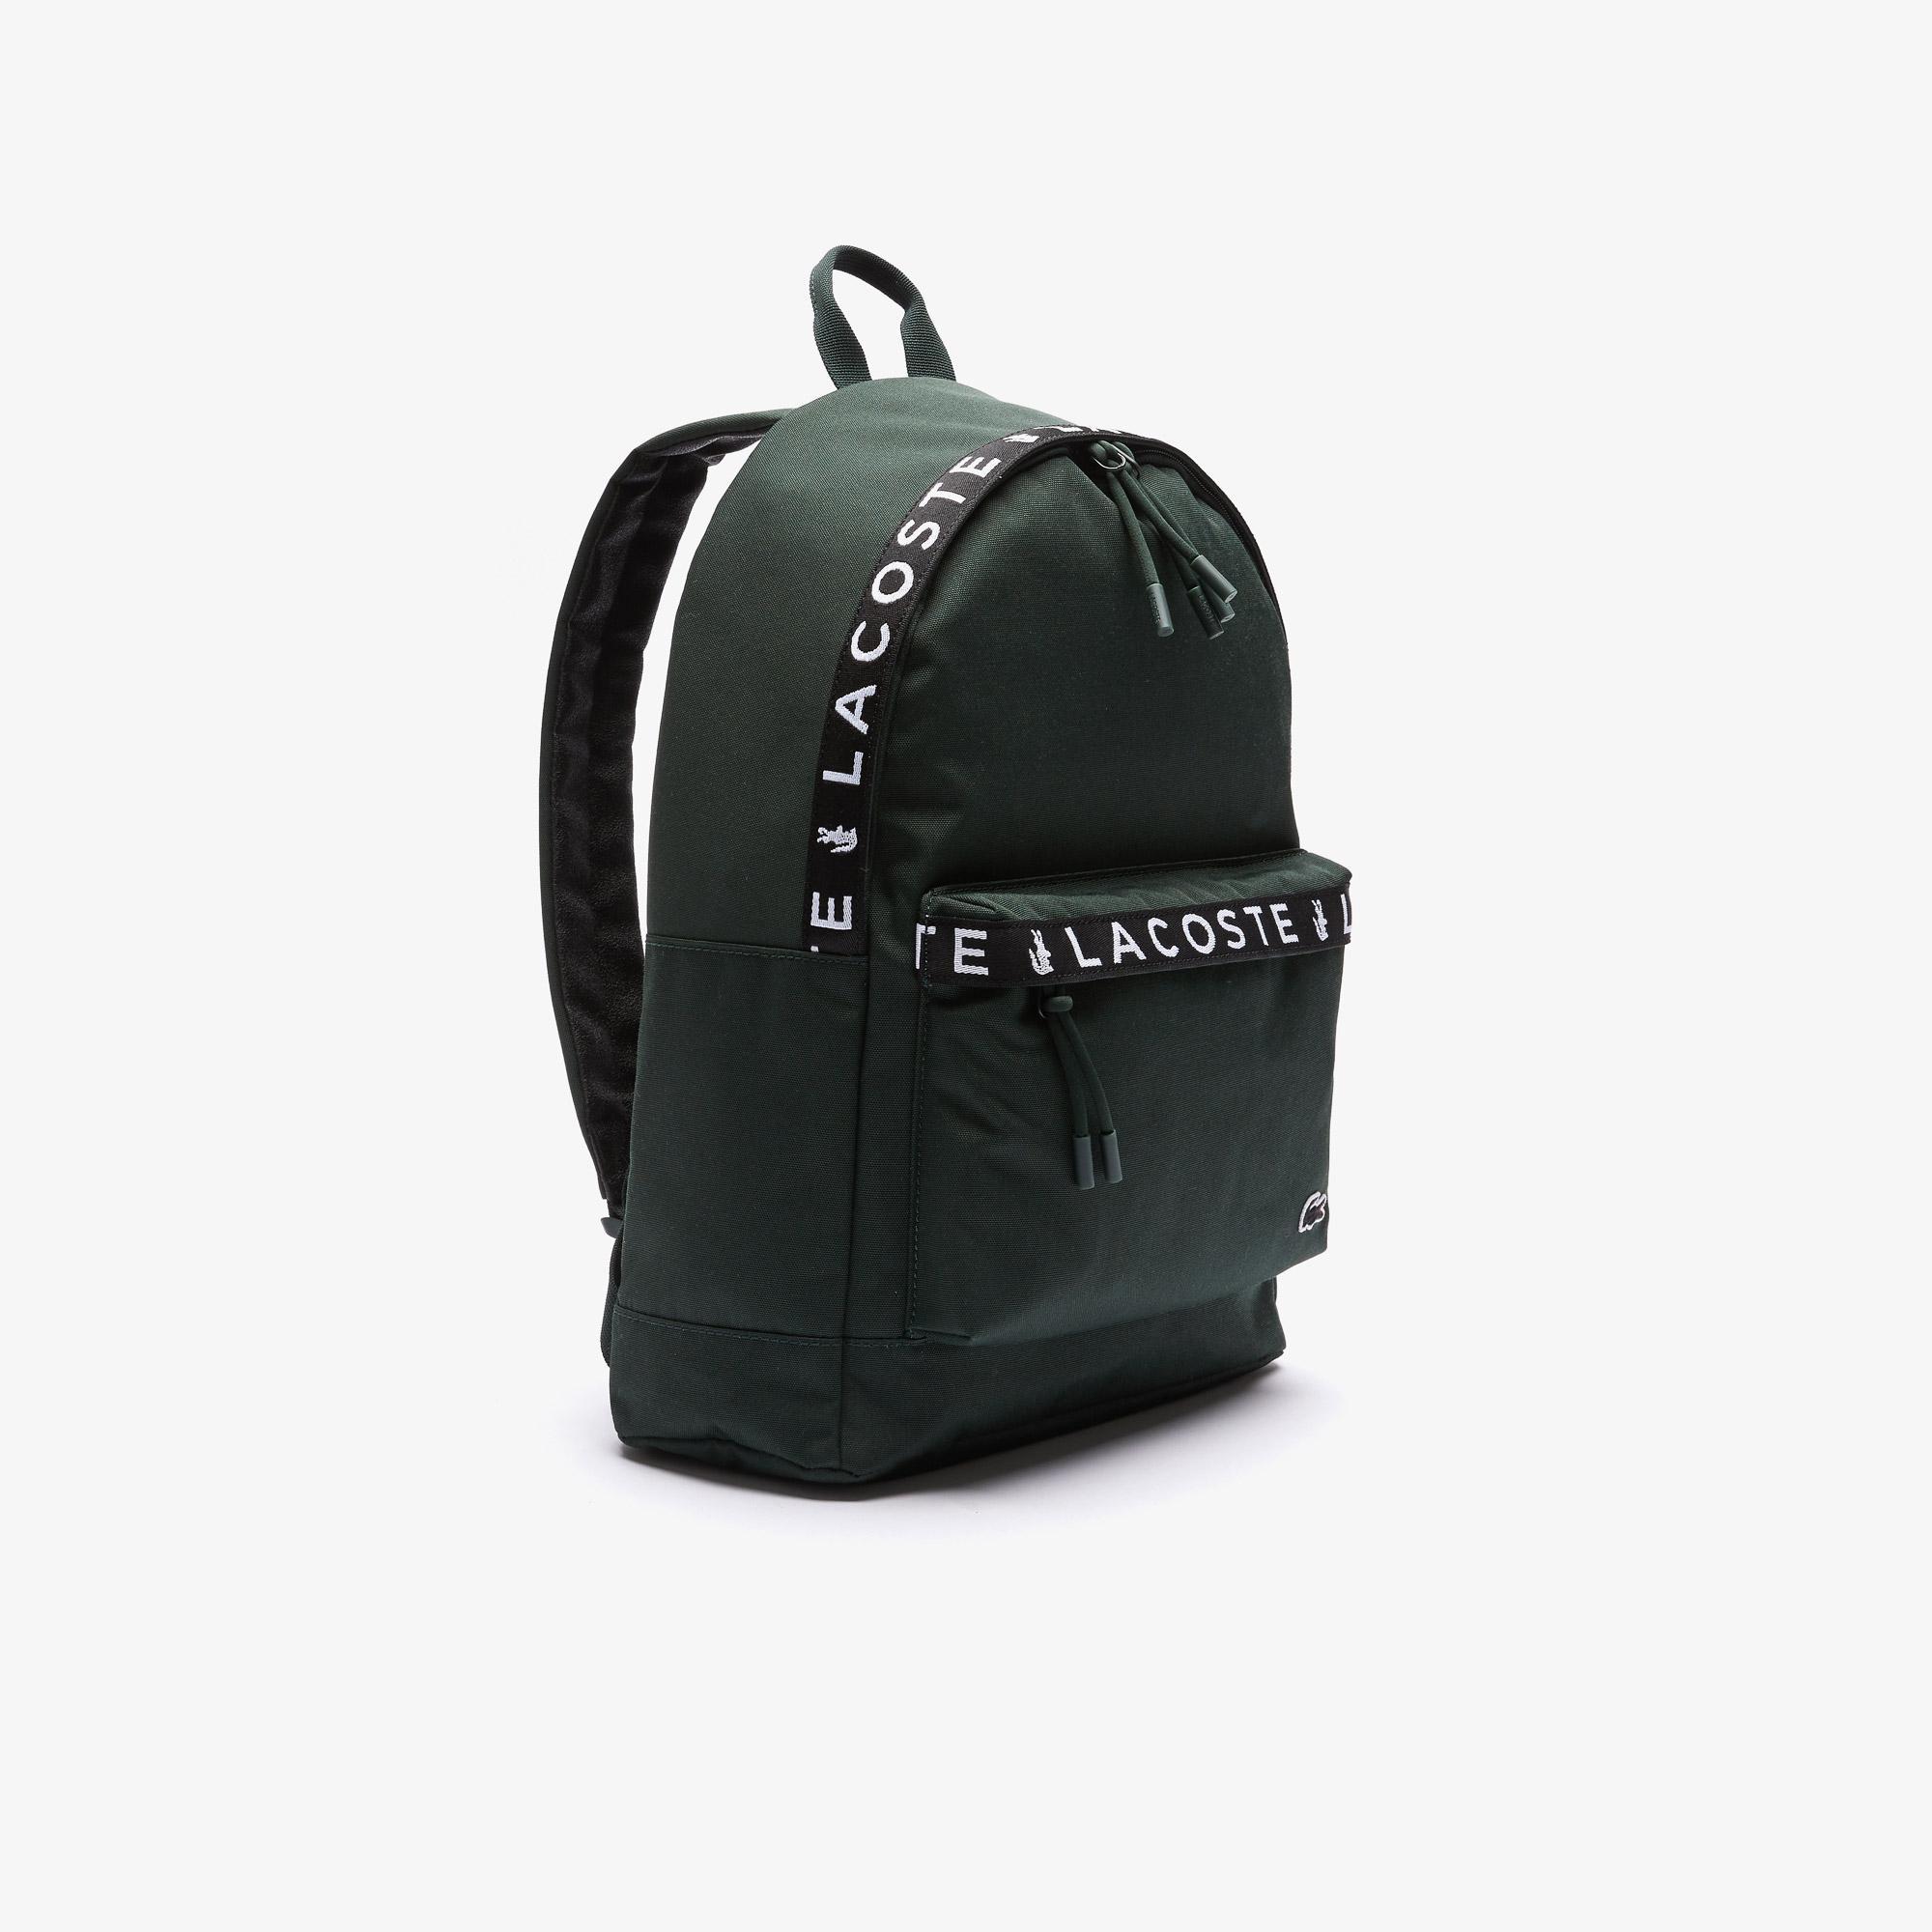 Lacoste Men's Neocroc Lettered Bands Canvas Backpack